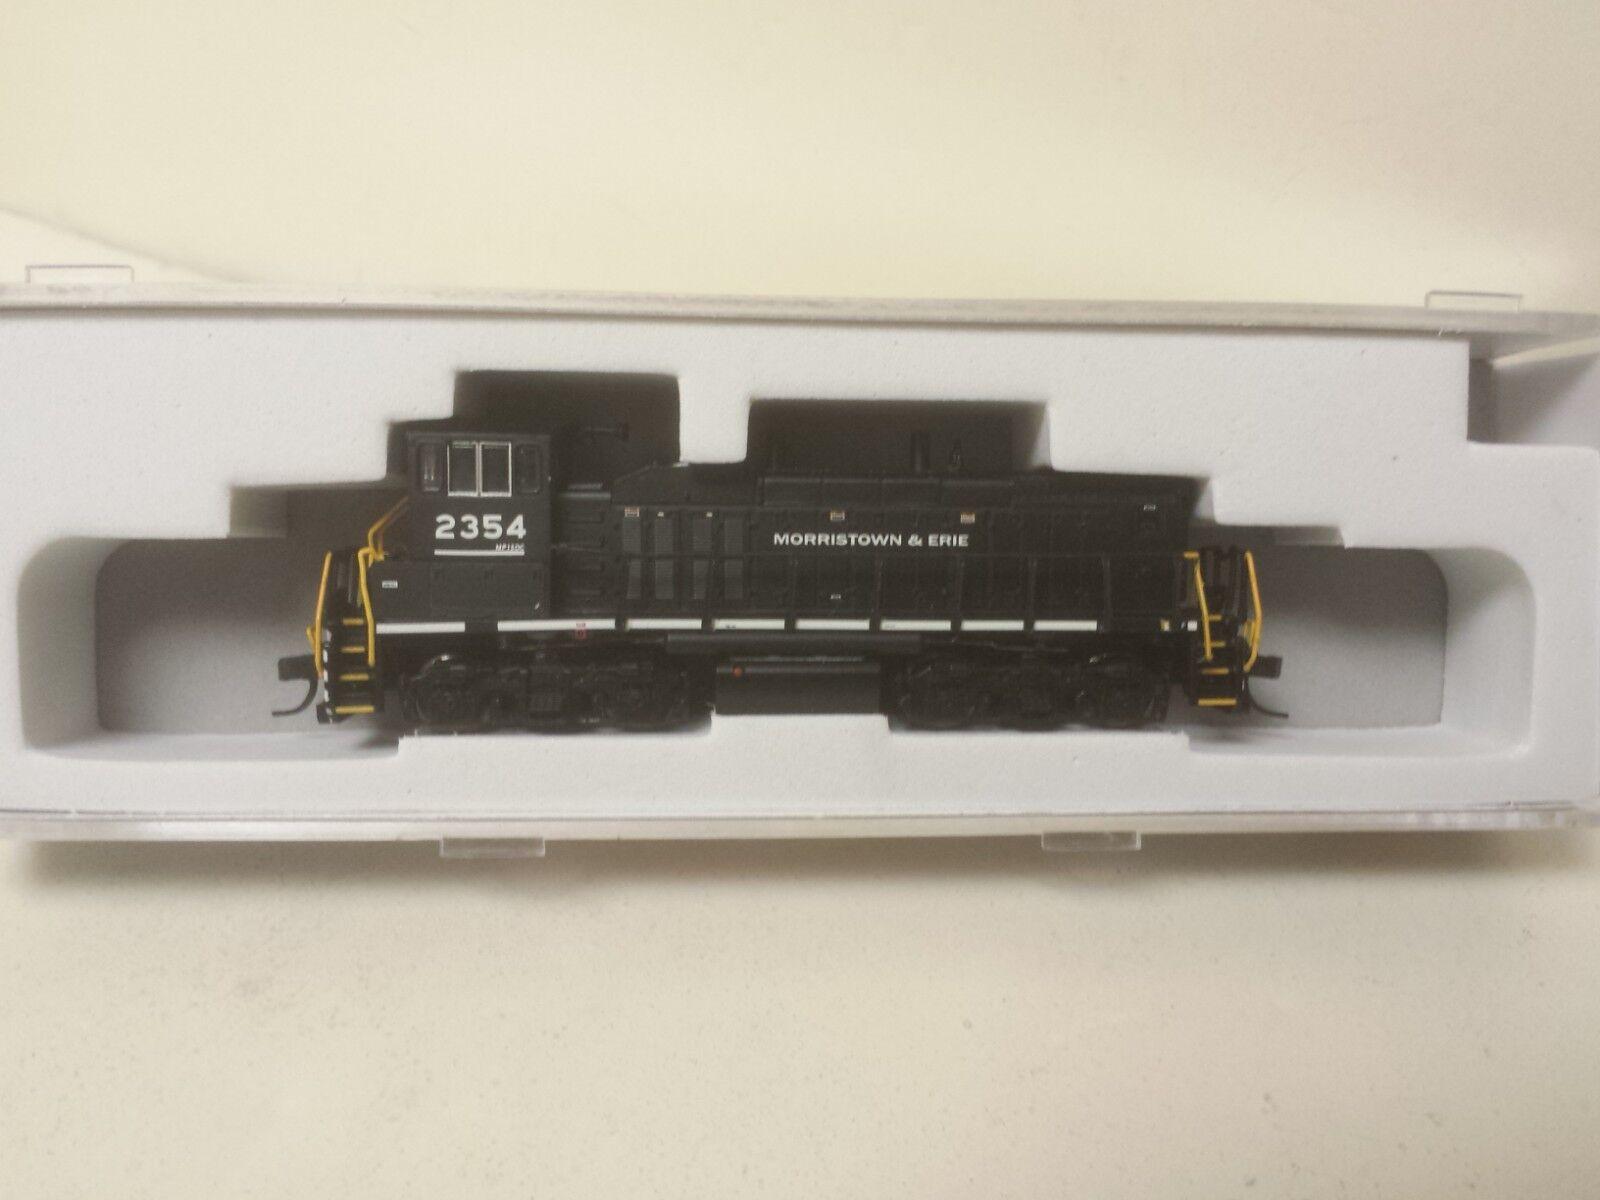 Morristown Erie FerroCocheril EMD MP15DC Diesel 2354 Atlas 40 003 820 NCE DCC ESCALA N